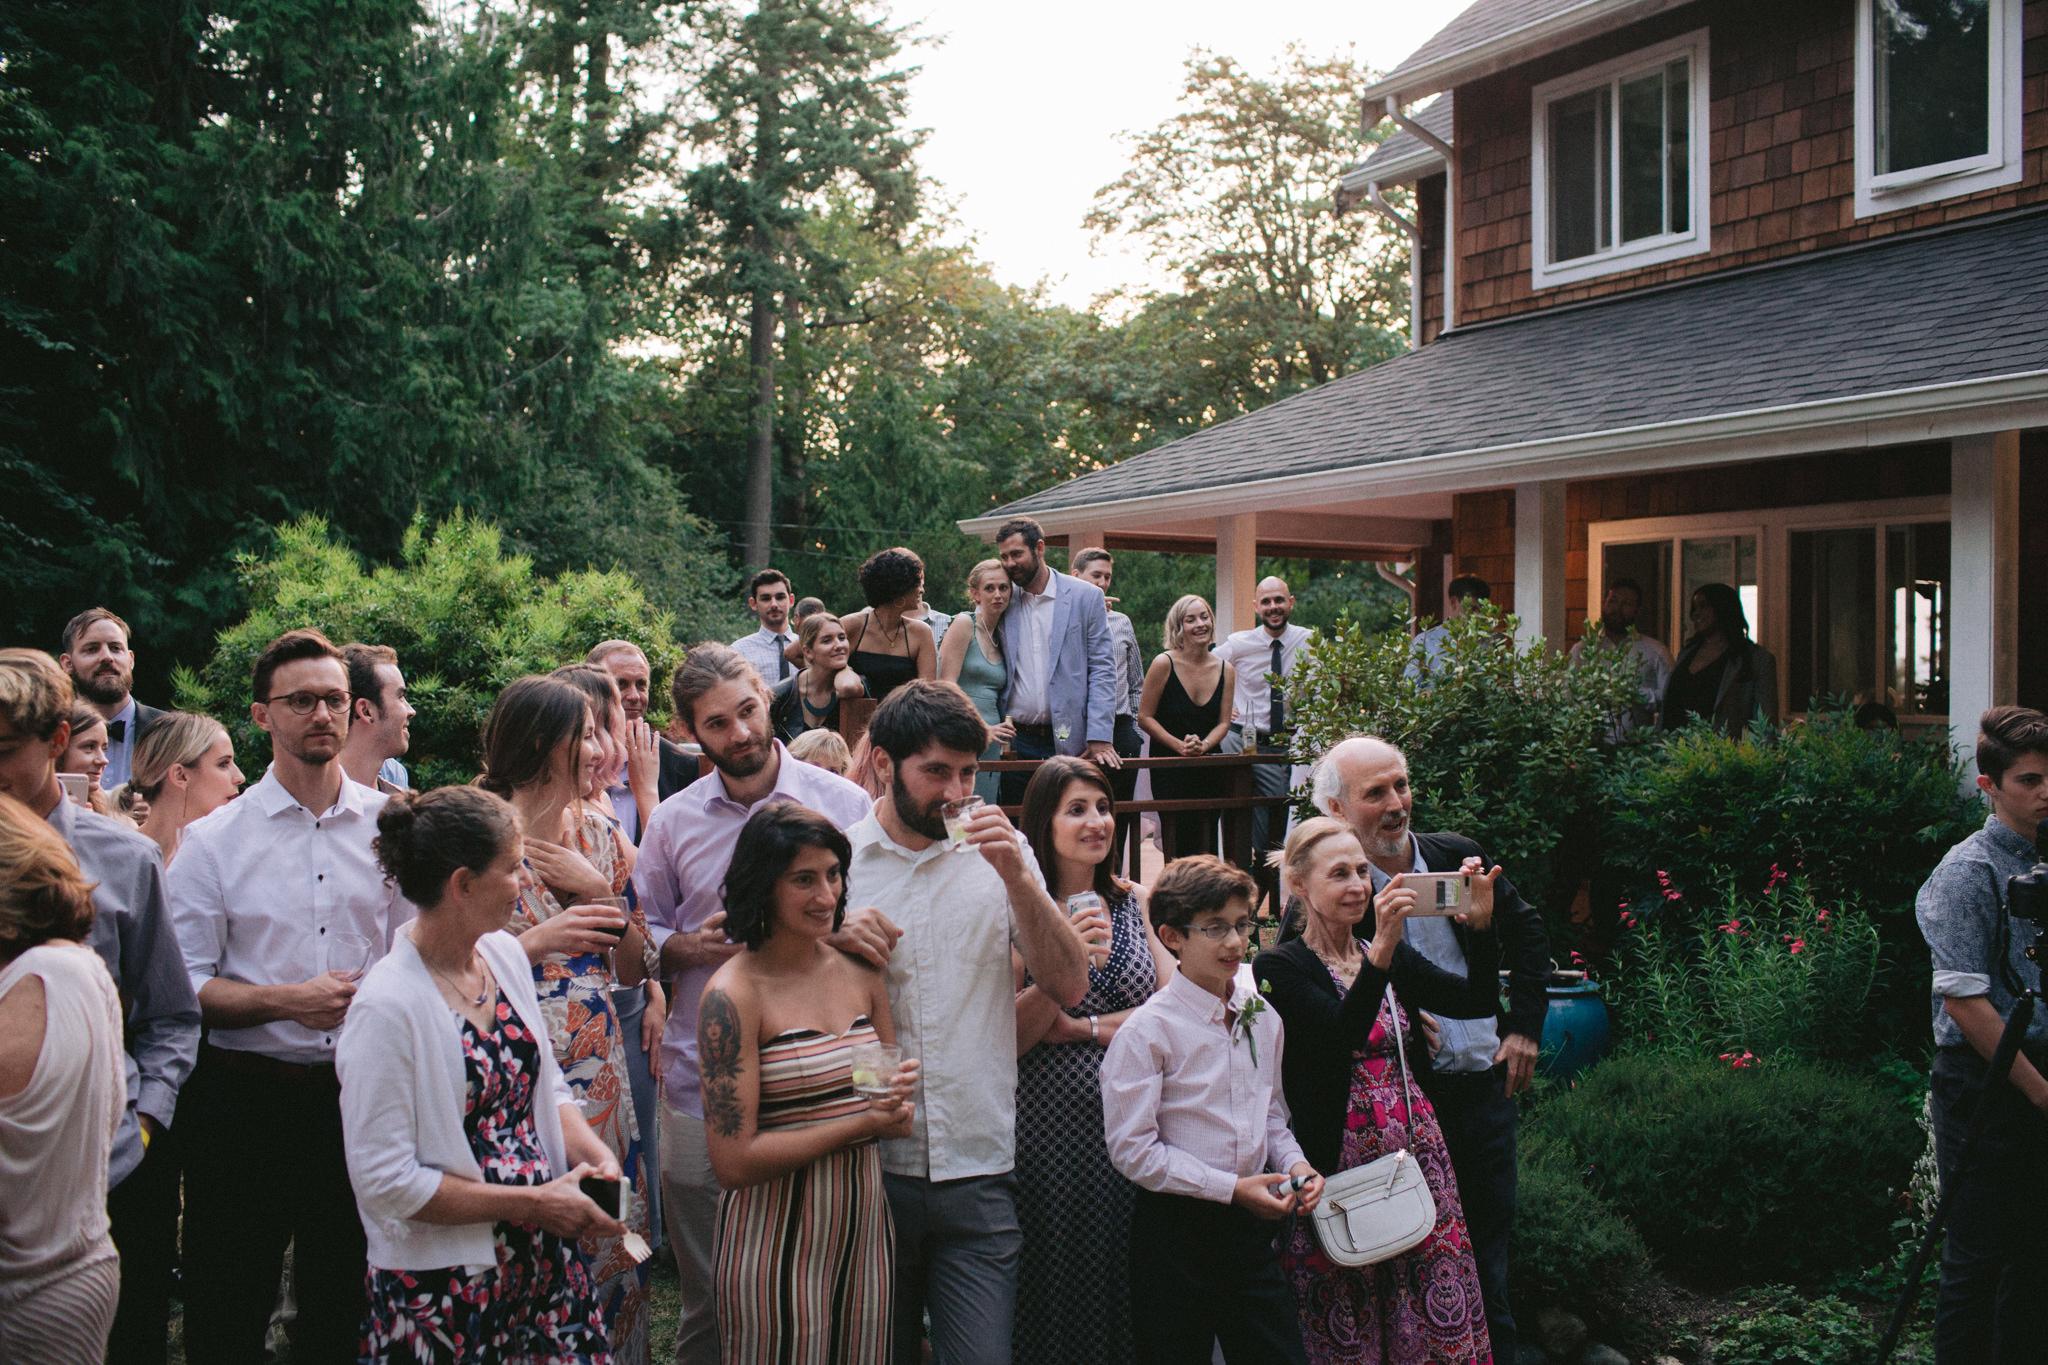 Backyard-Bainbridge-Island-Wedding-Alycia-Lovell-Photography-197.JPG